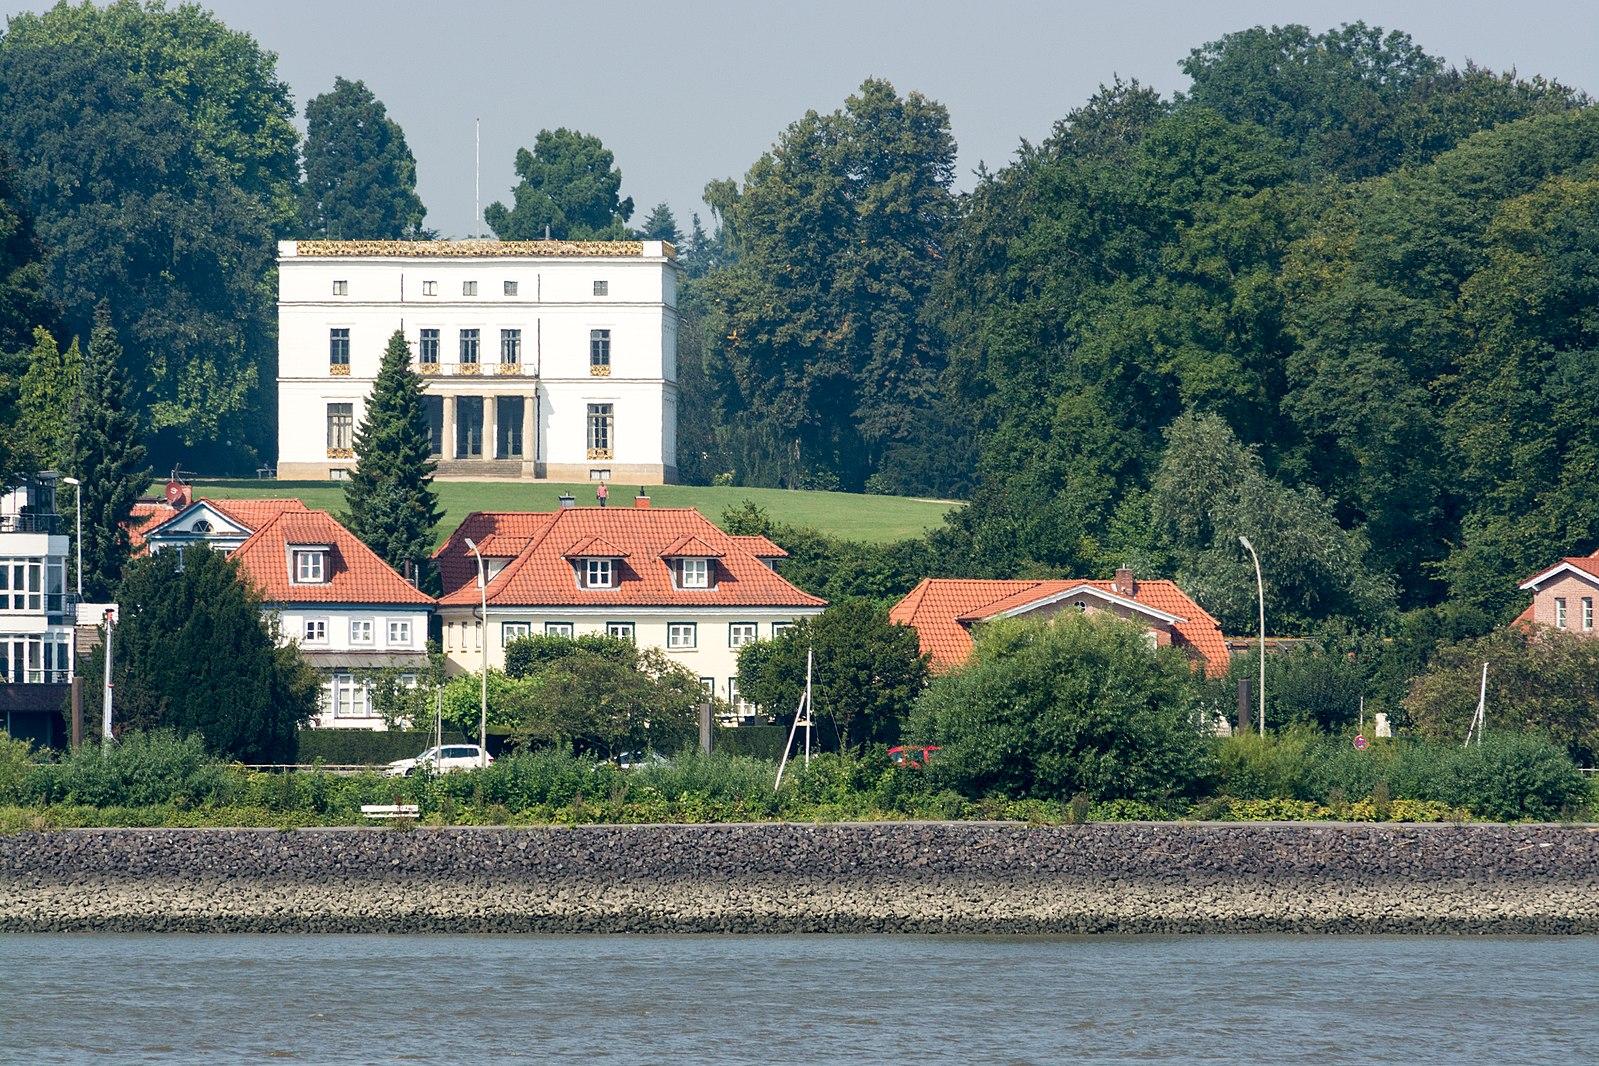 Jenisch Haus / Foto: Ajepbah